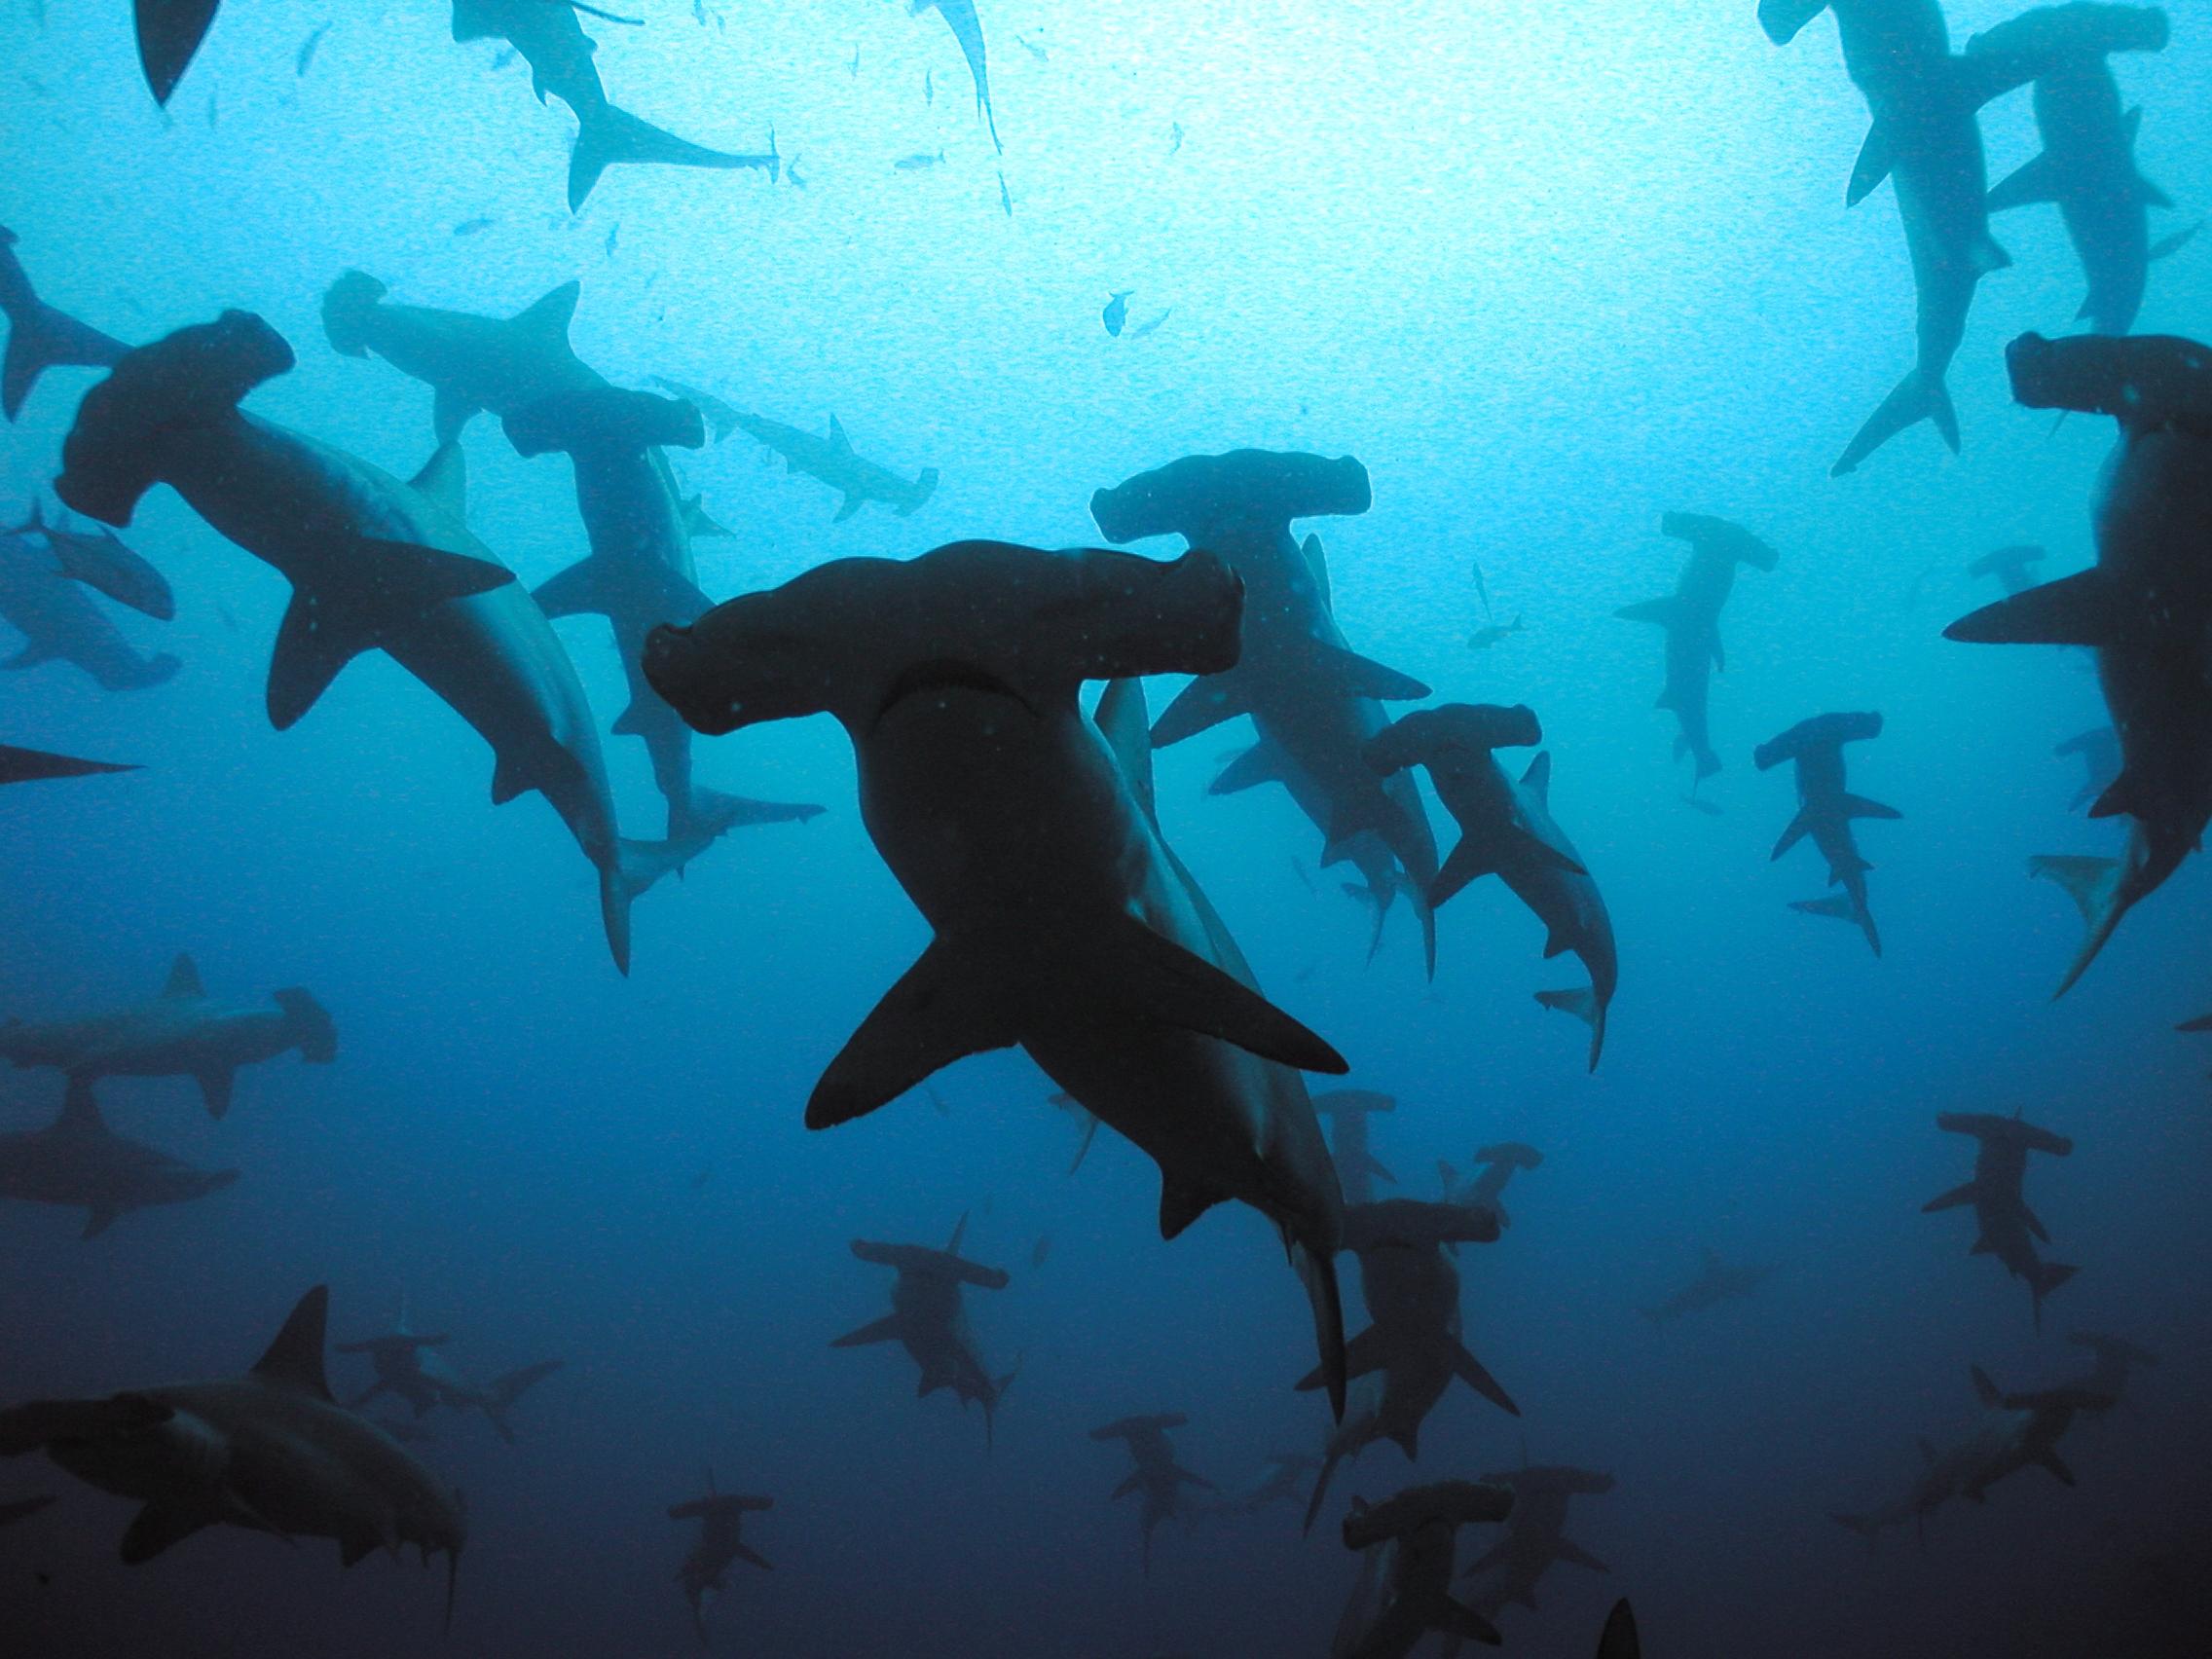 hammerhead shark portraits from the deep